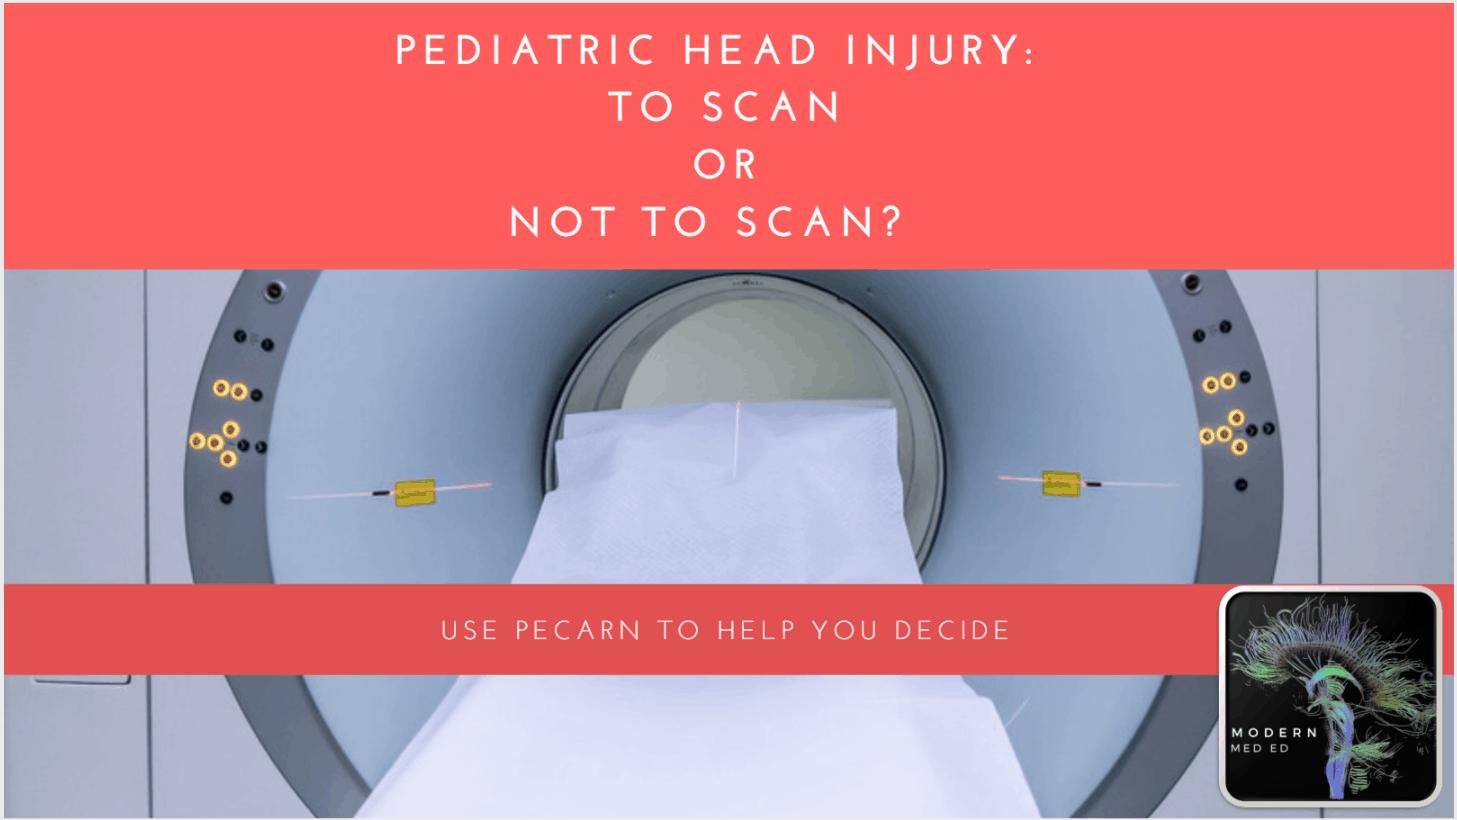 PECARN for Pediatric Head Injury | Modern MedEd